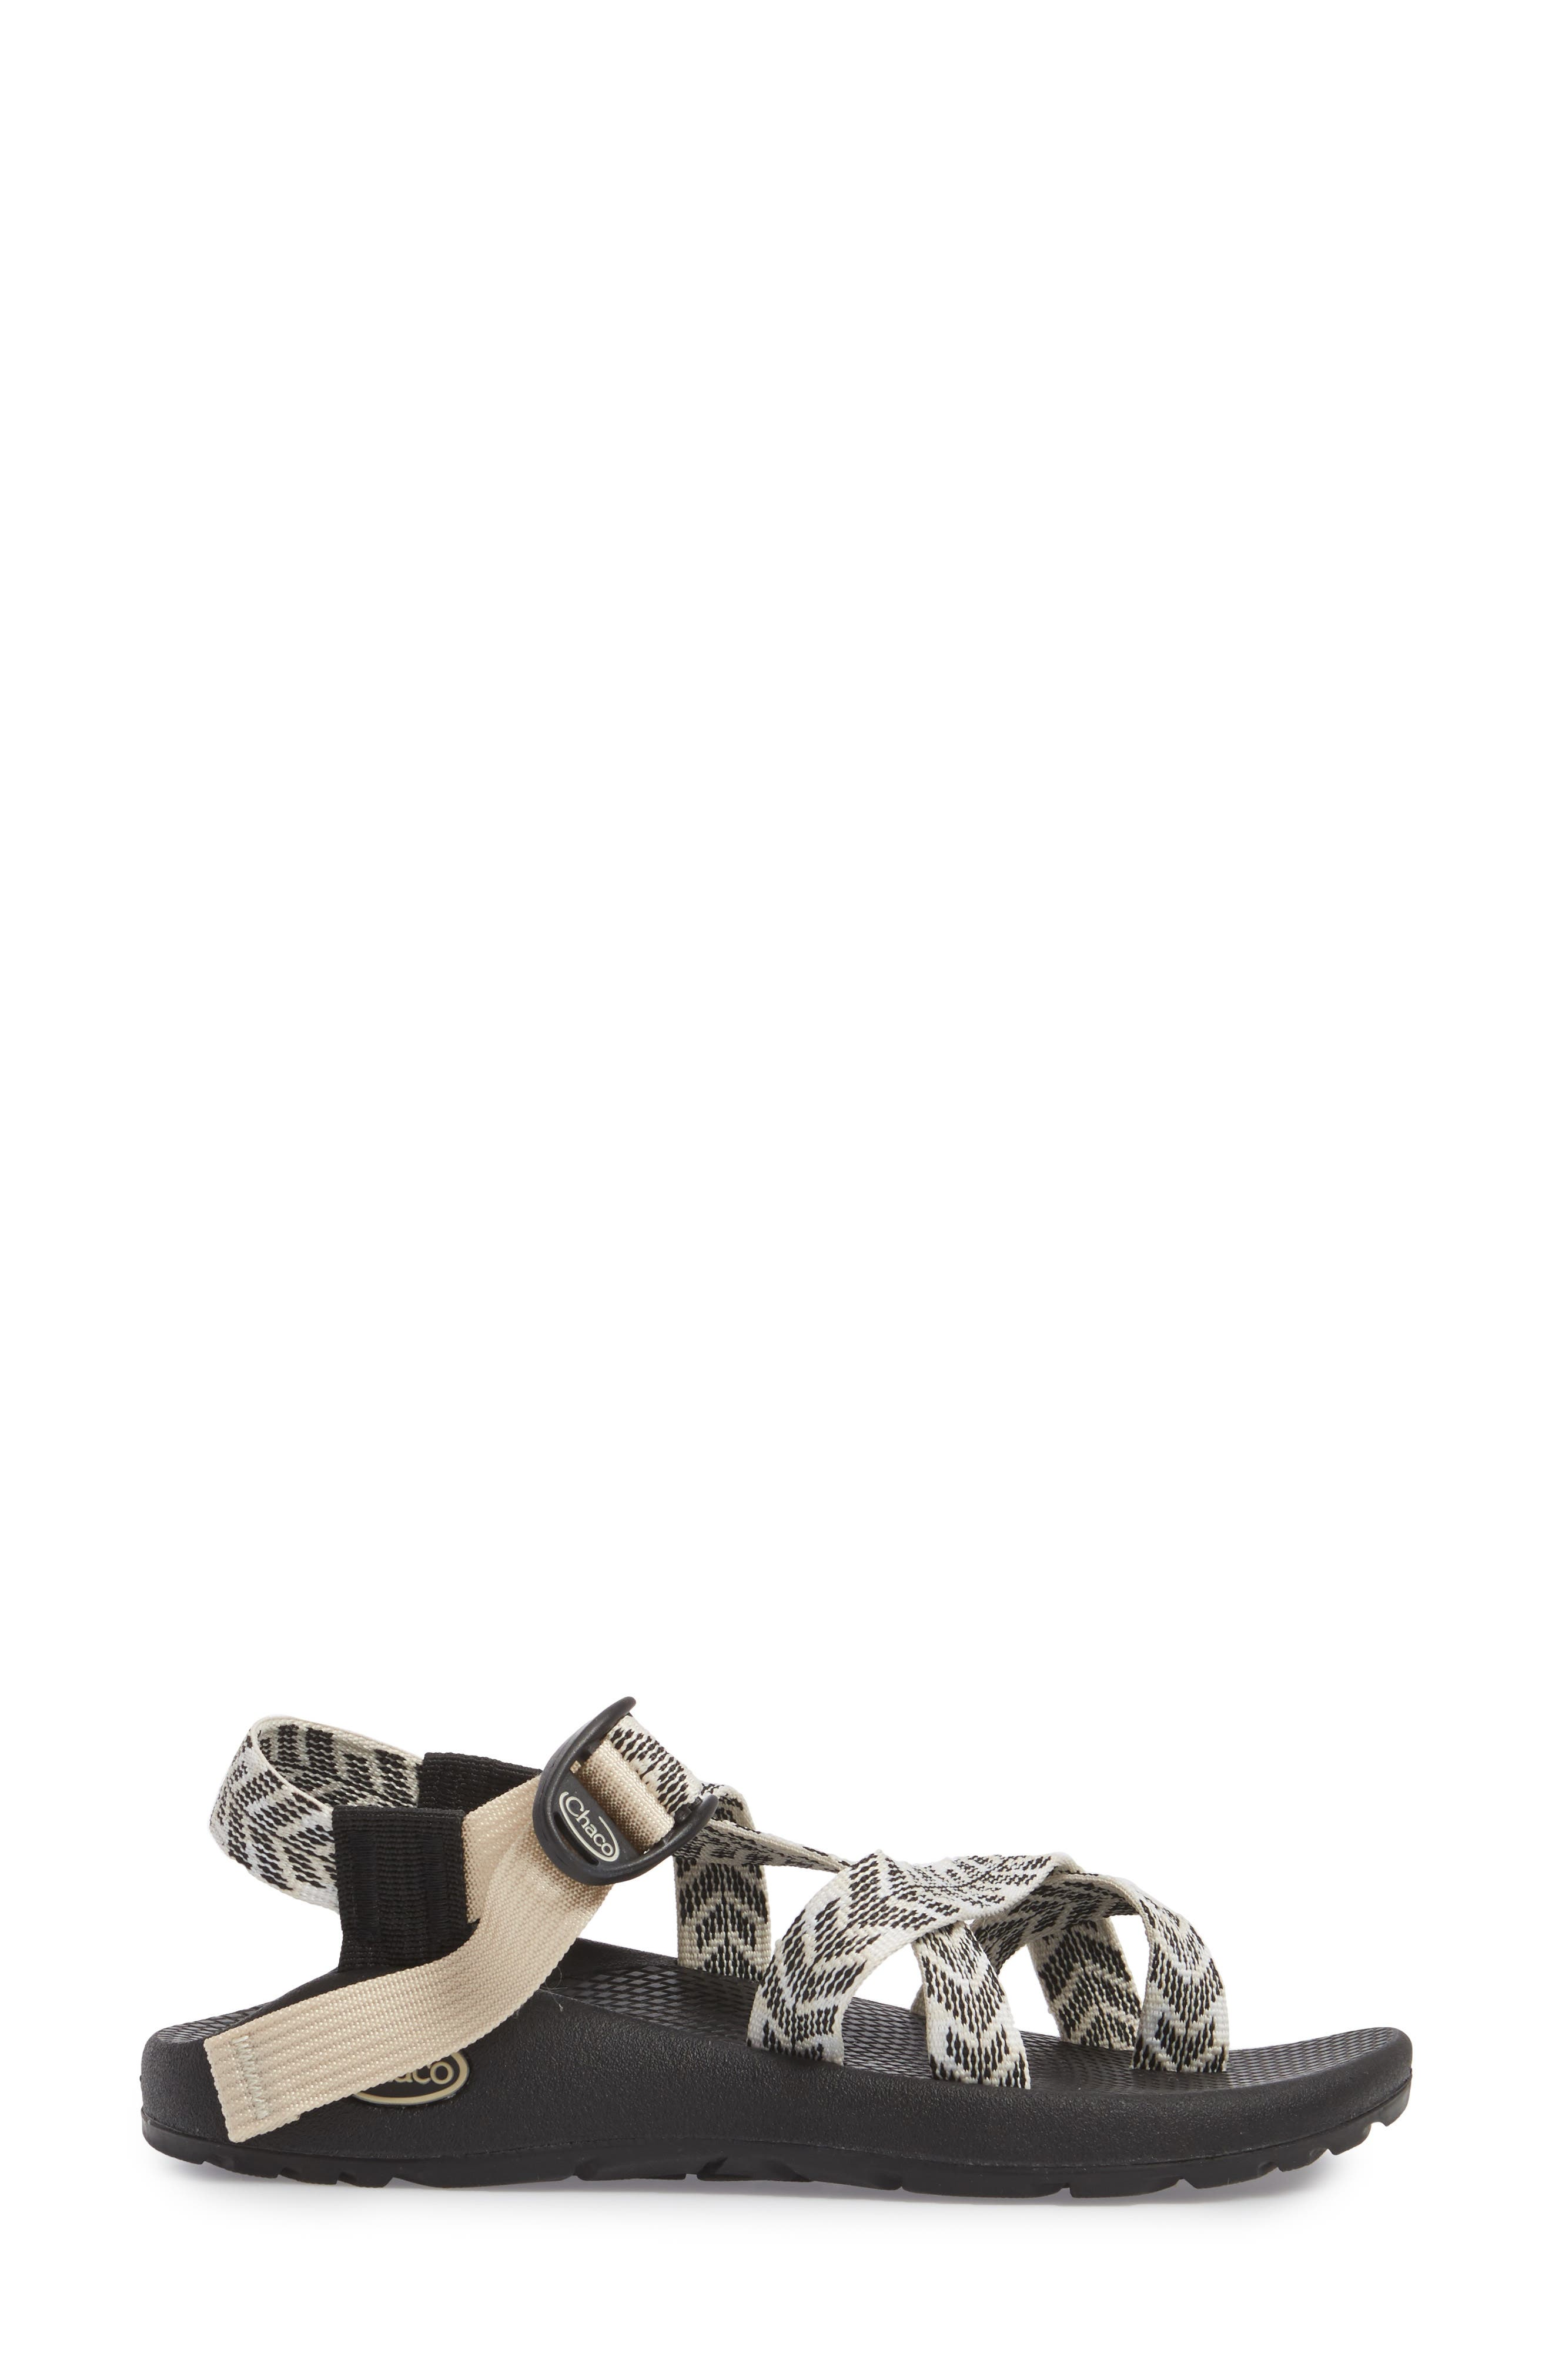 Z/2 Classic Sport Sandal,                             Alternate thumbnail 3, color,                             TRINE BLACK / WHITE